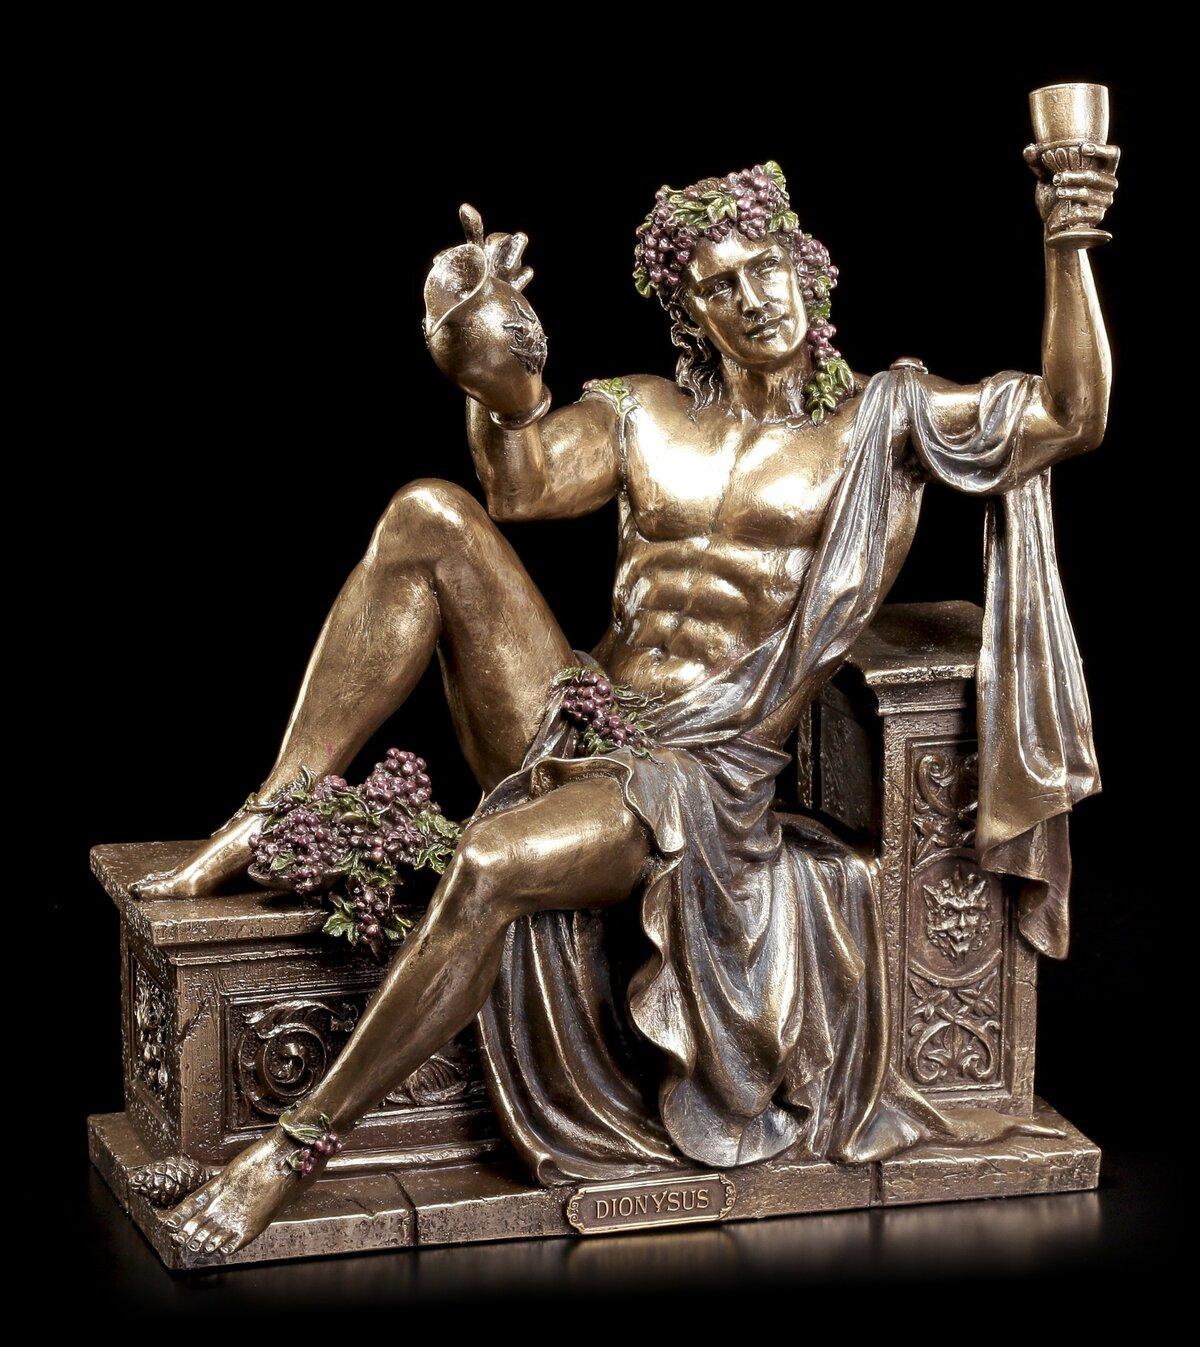 изделий бог вина дионис картинки традициям